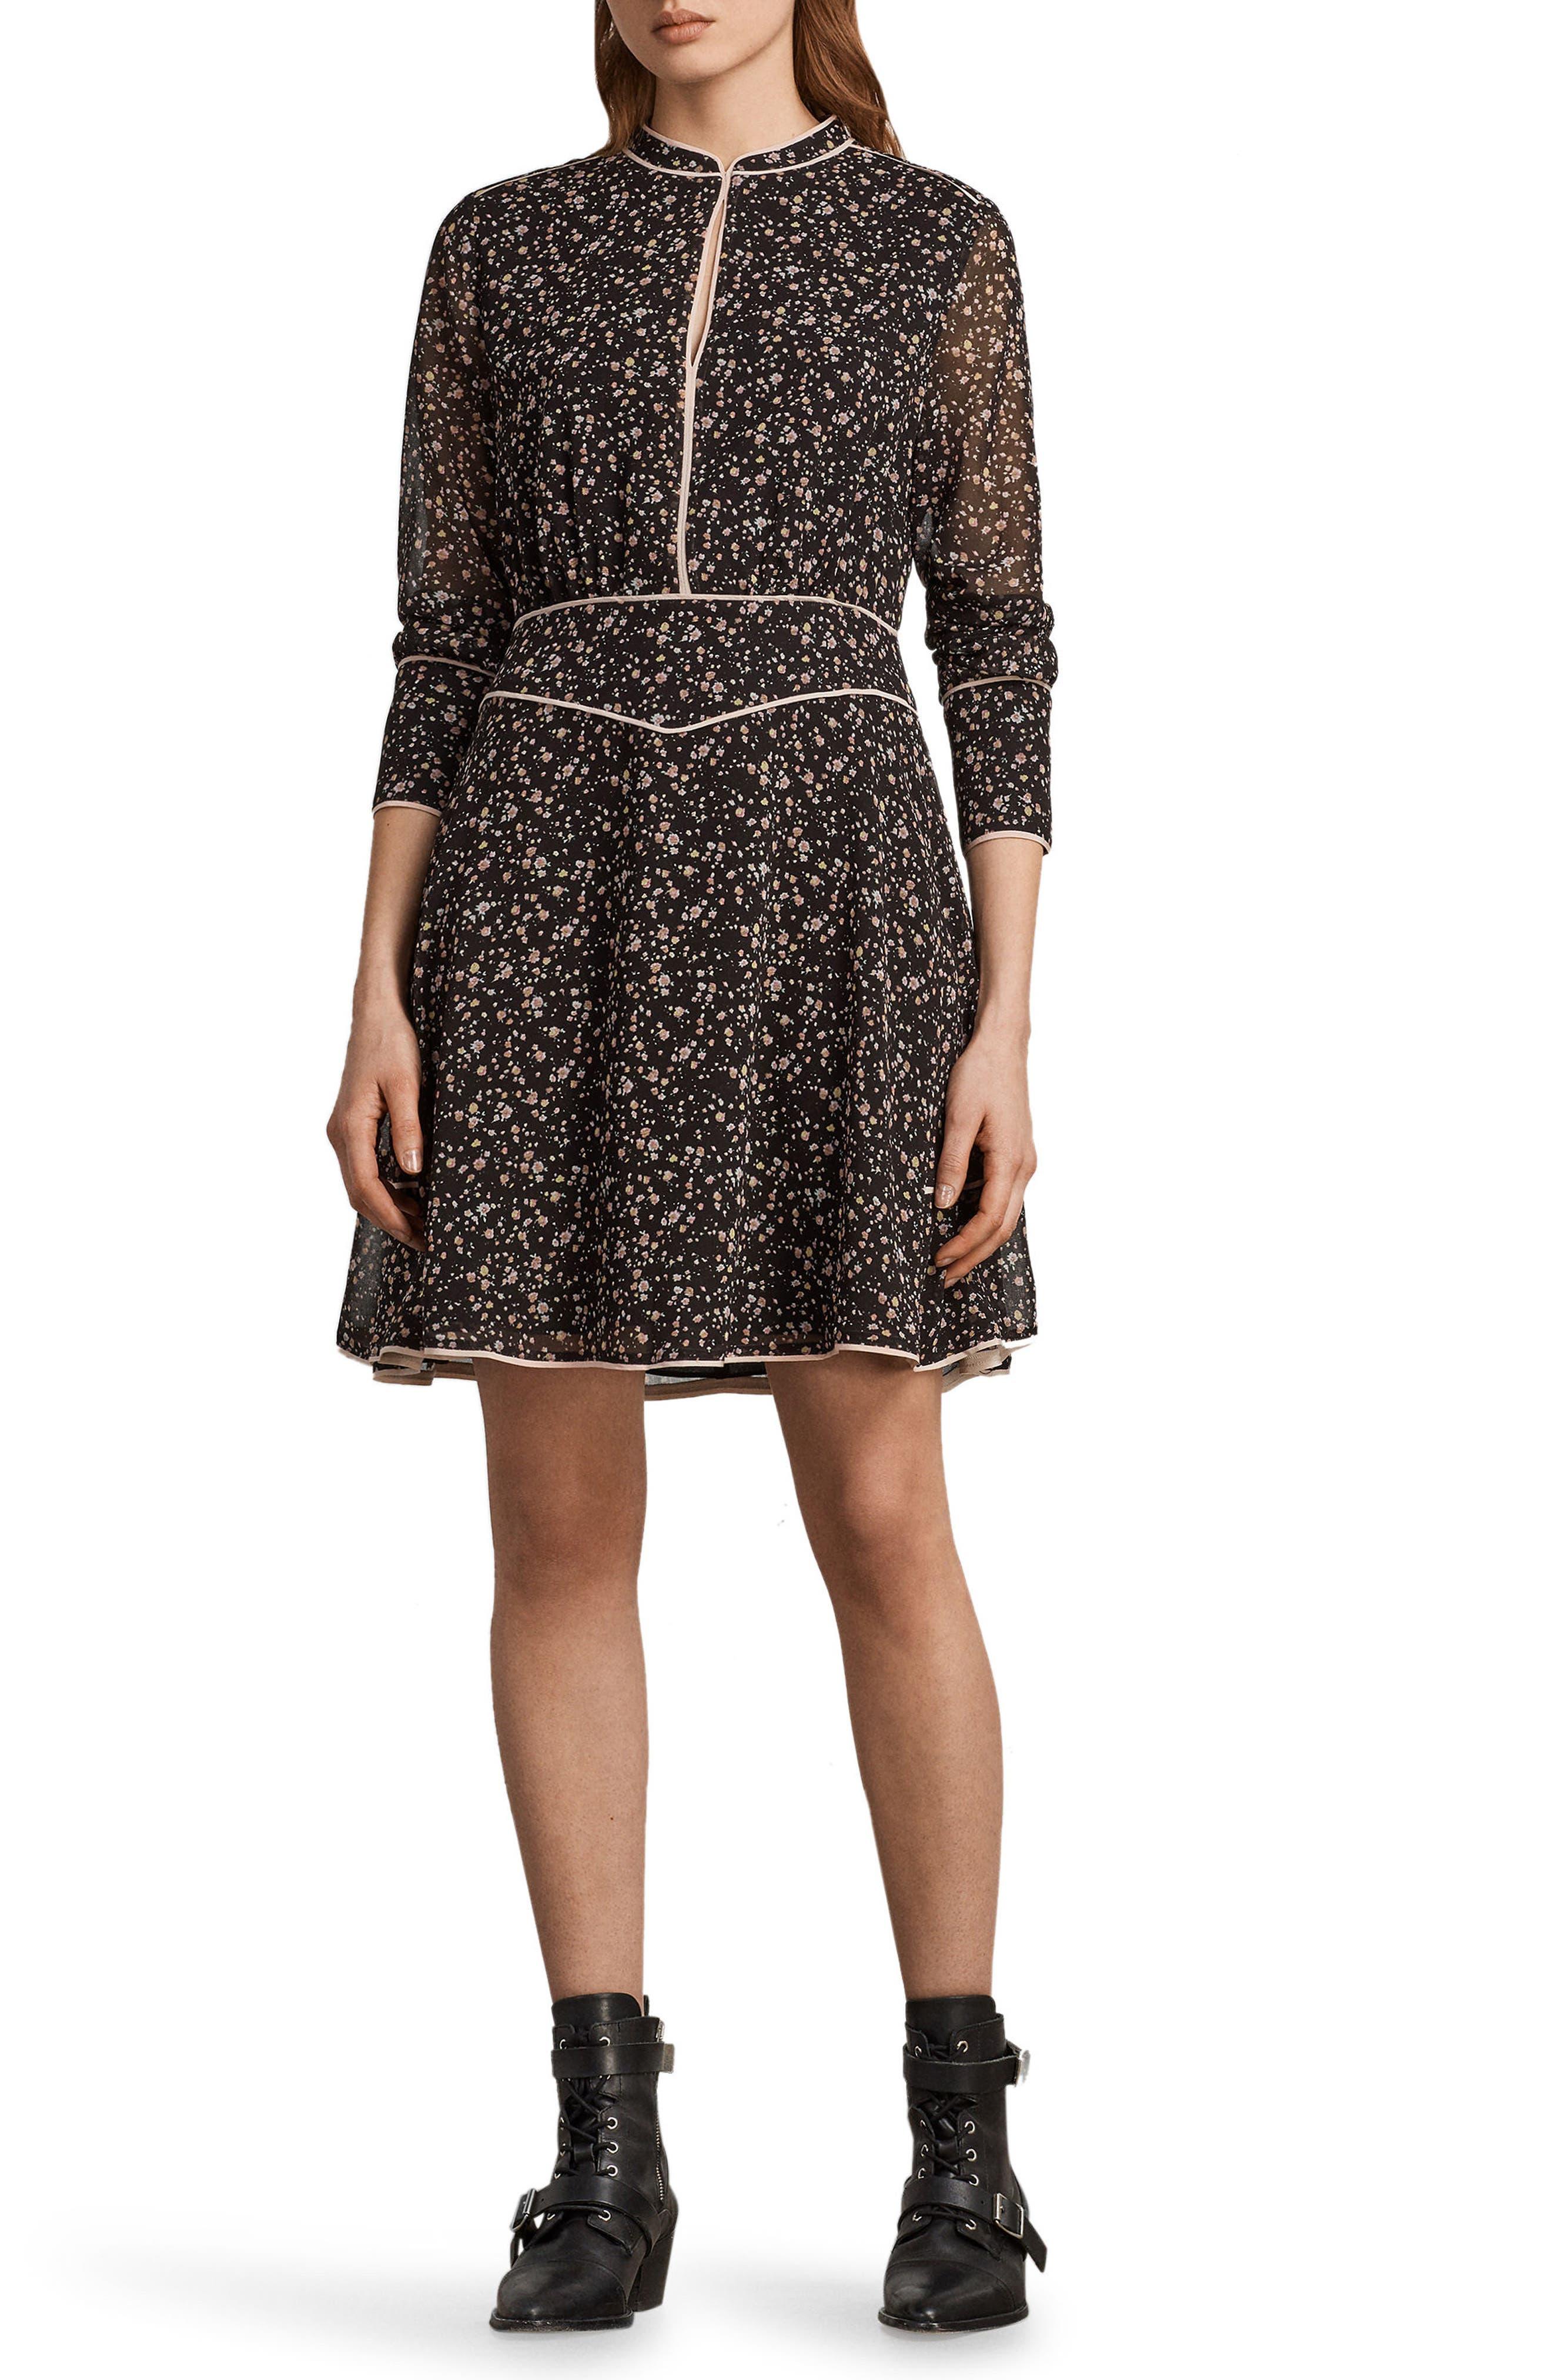 Kay Pepper Floral Print Dress,                         Main,                         color, 001